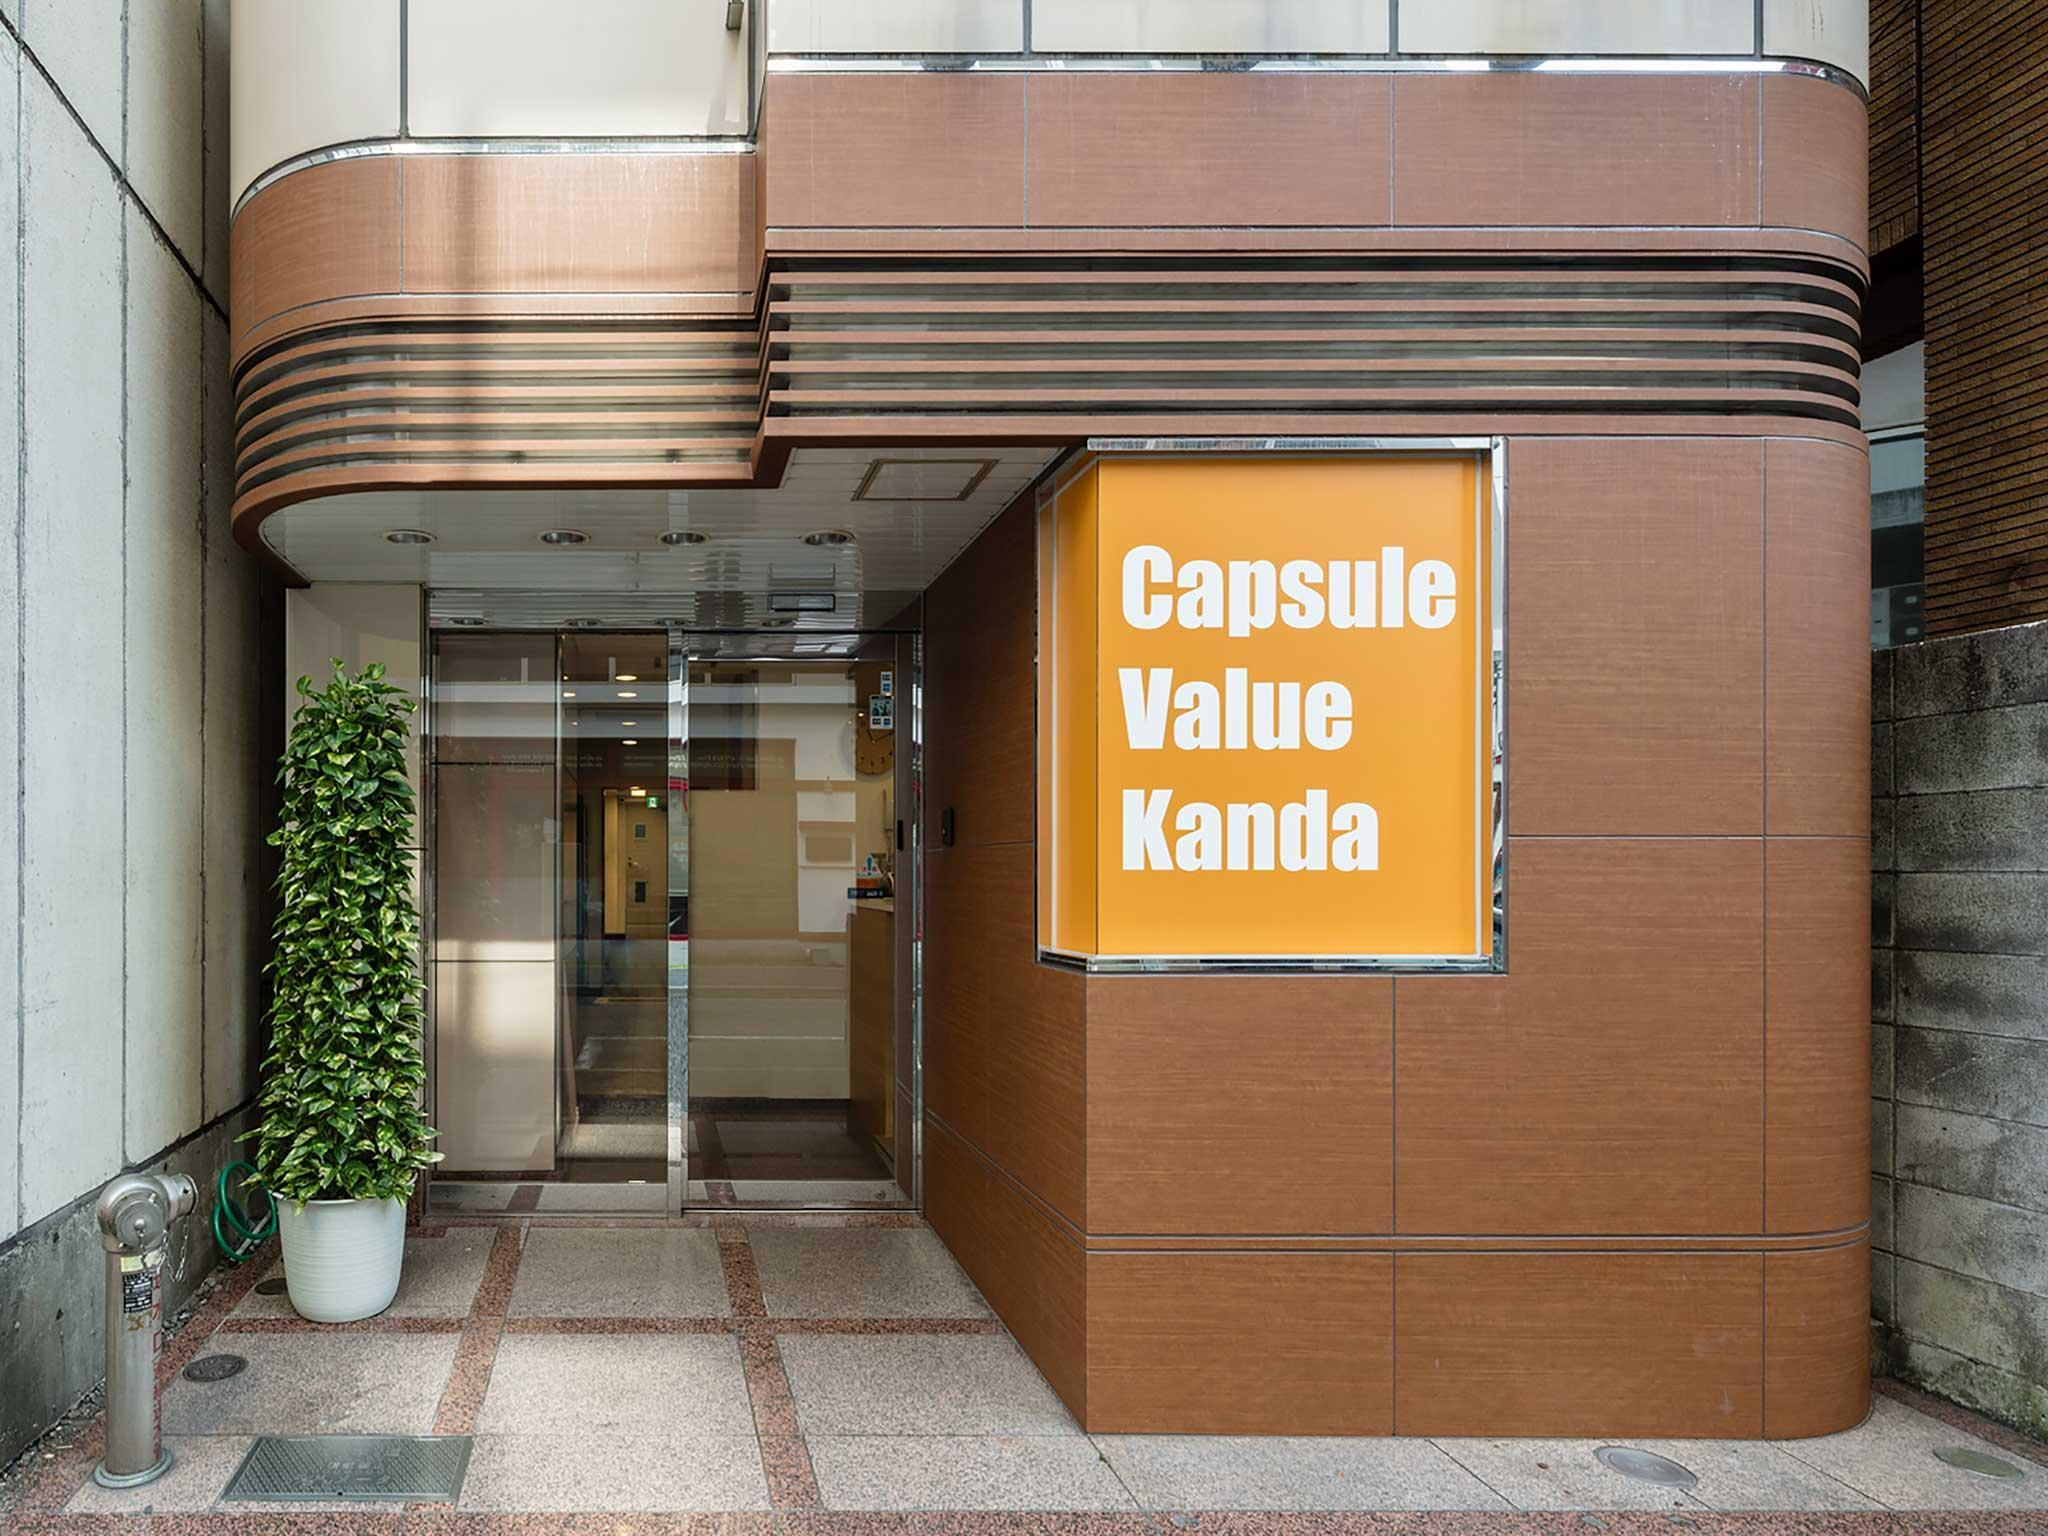 Capsule Value Kanda Hotel